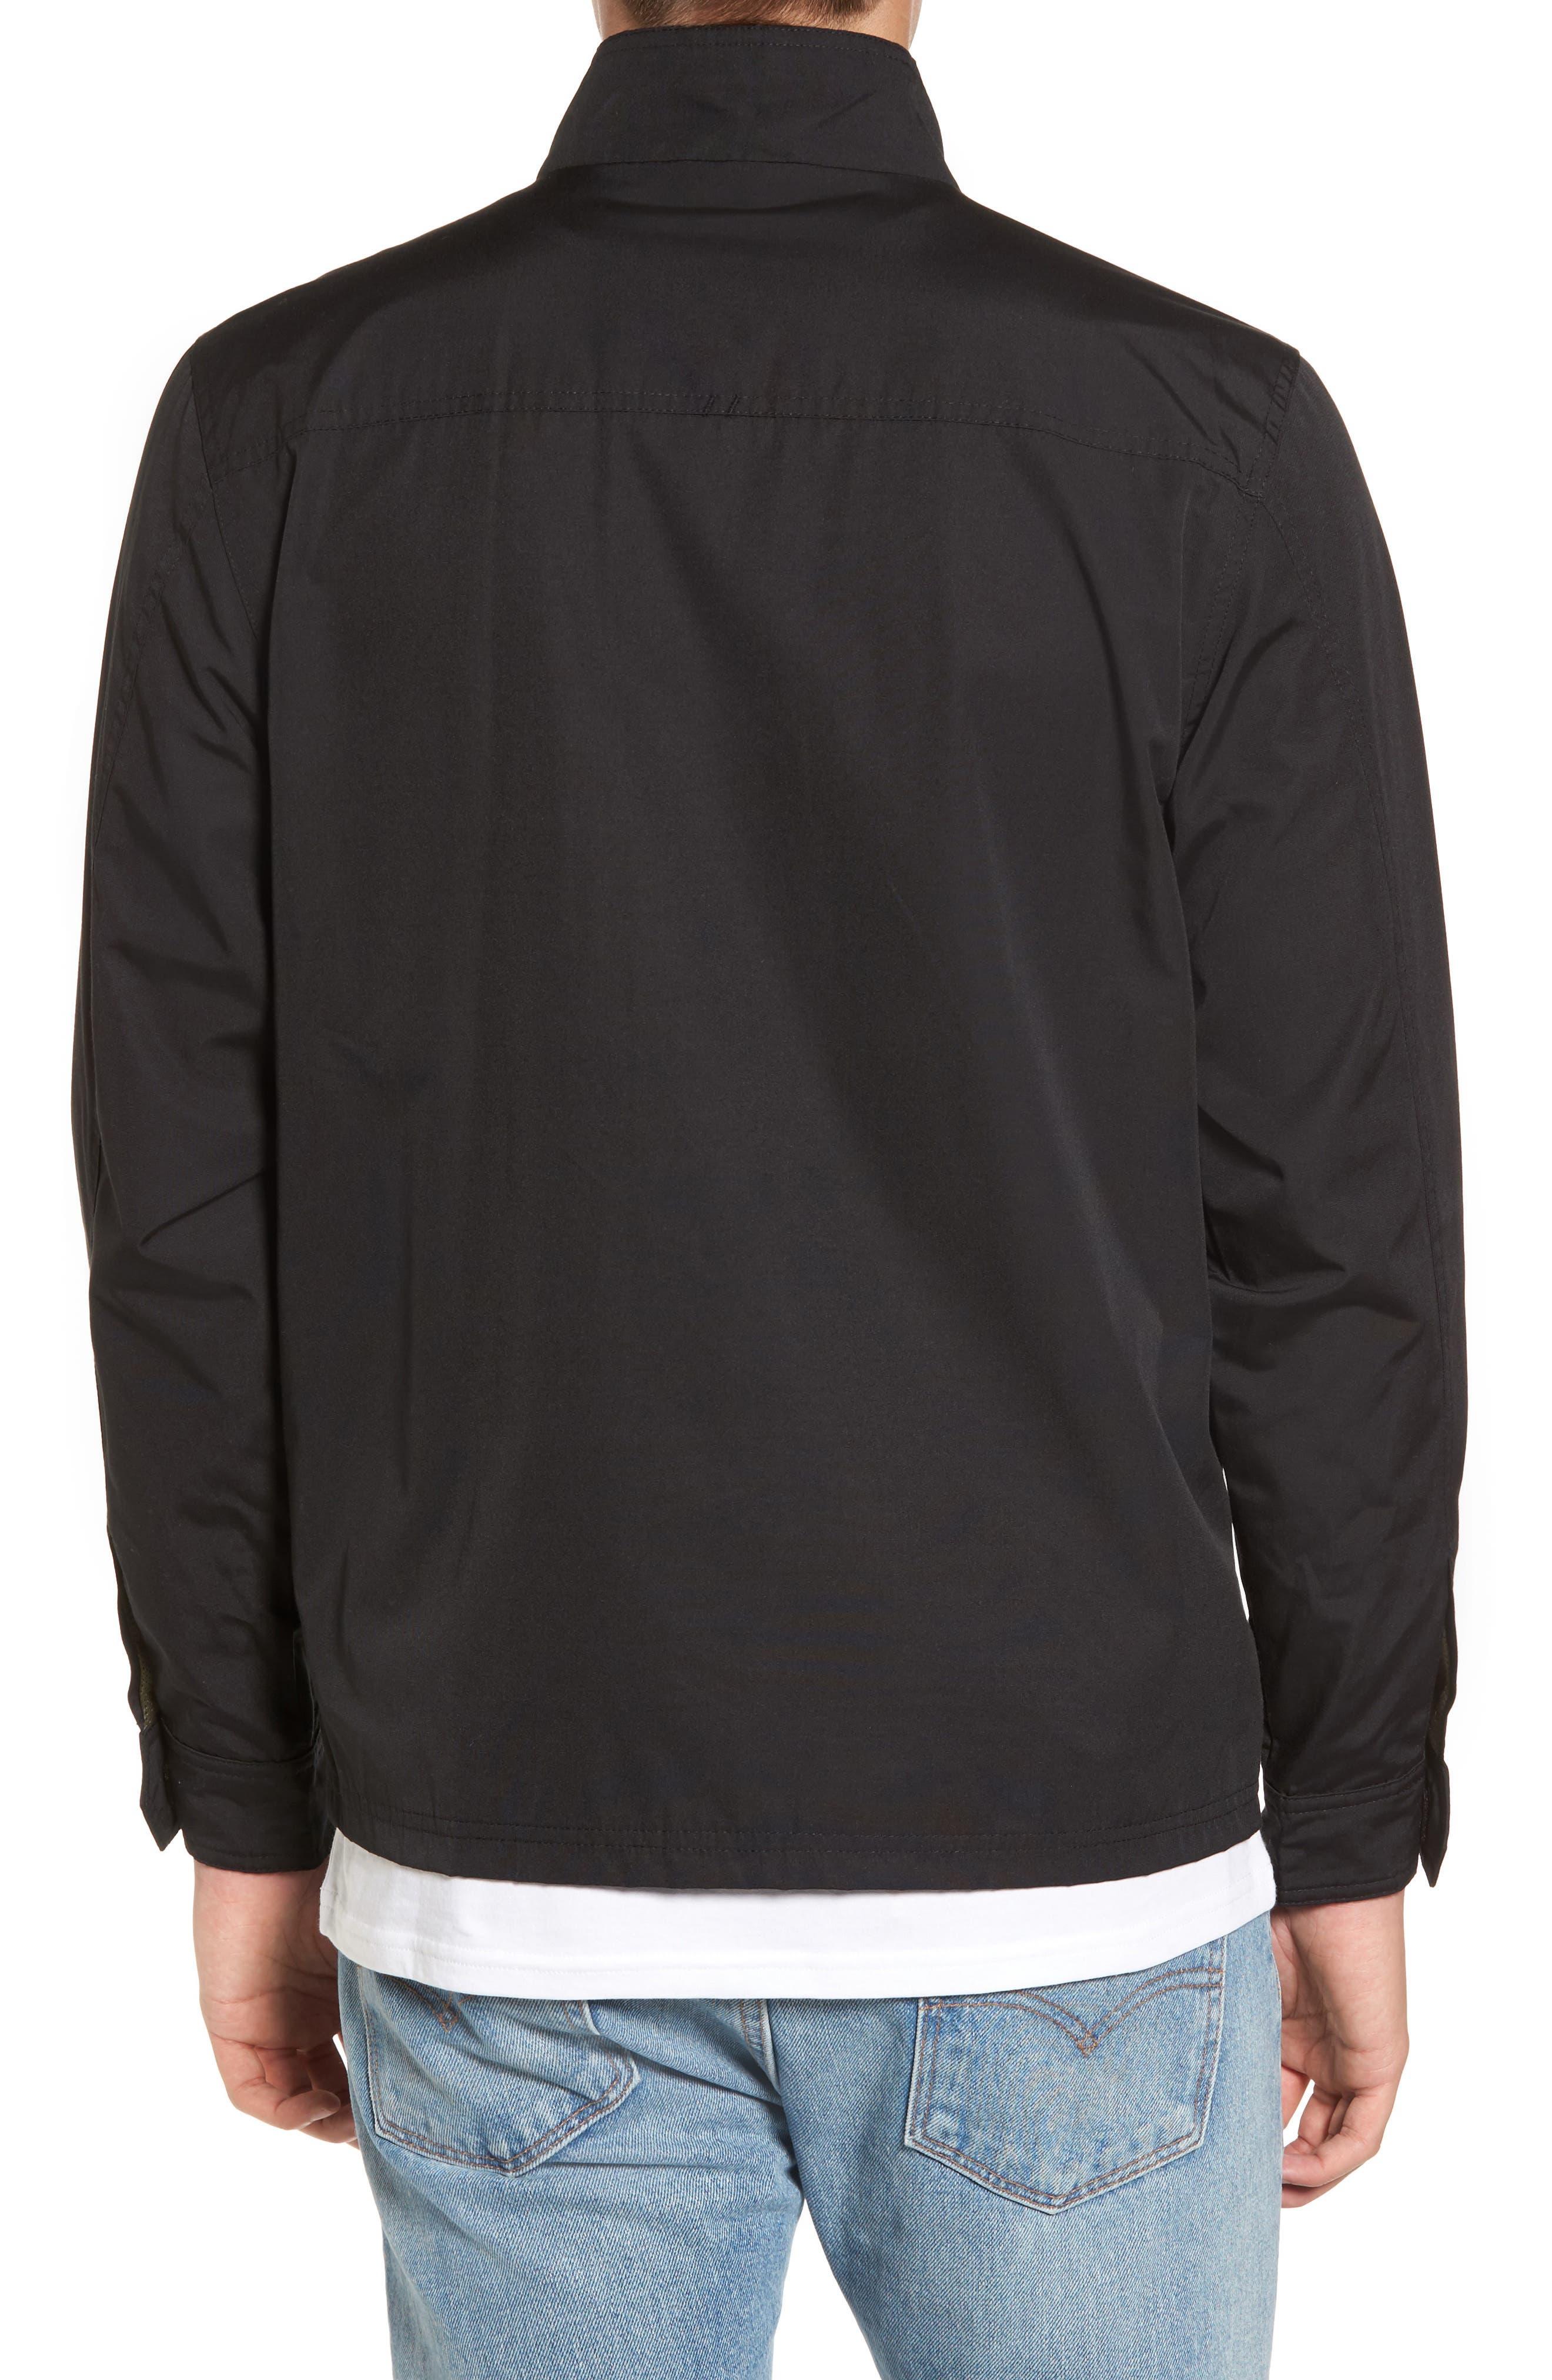 Staple Jacket,                             Alternate thumbnail 2, color,                             Solid Black